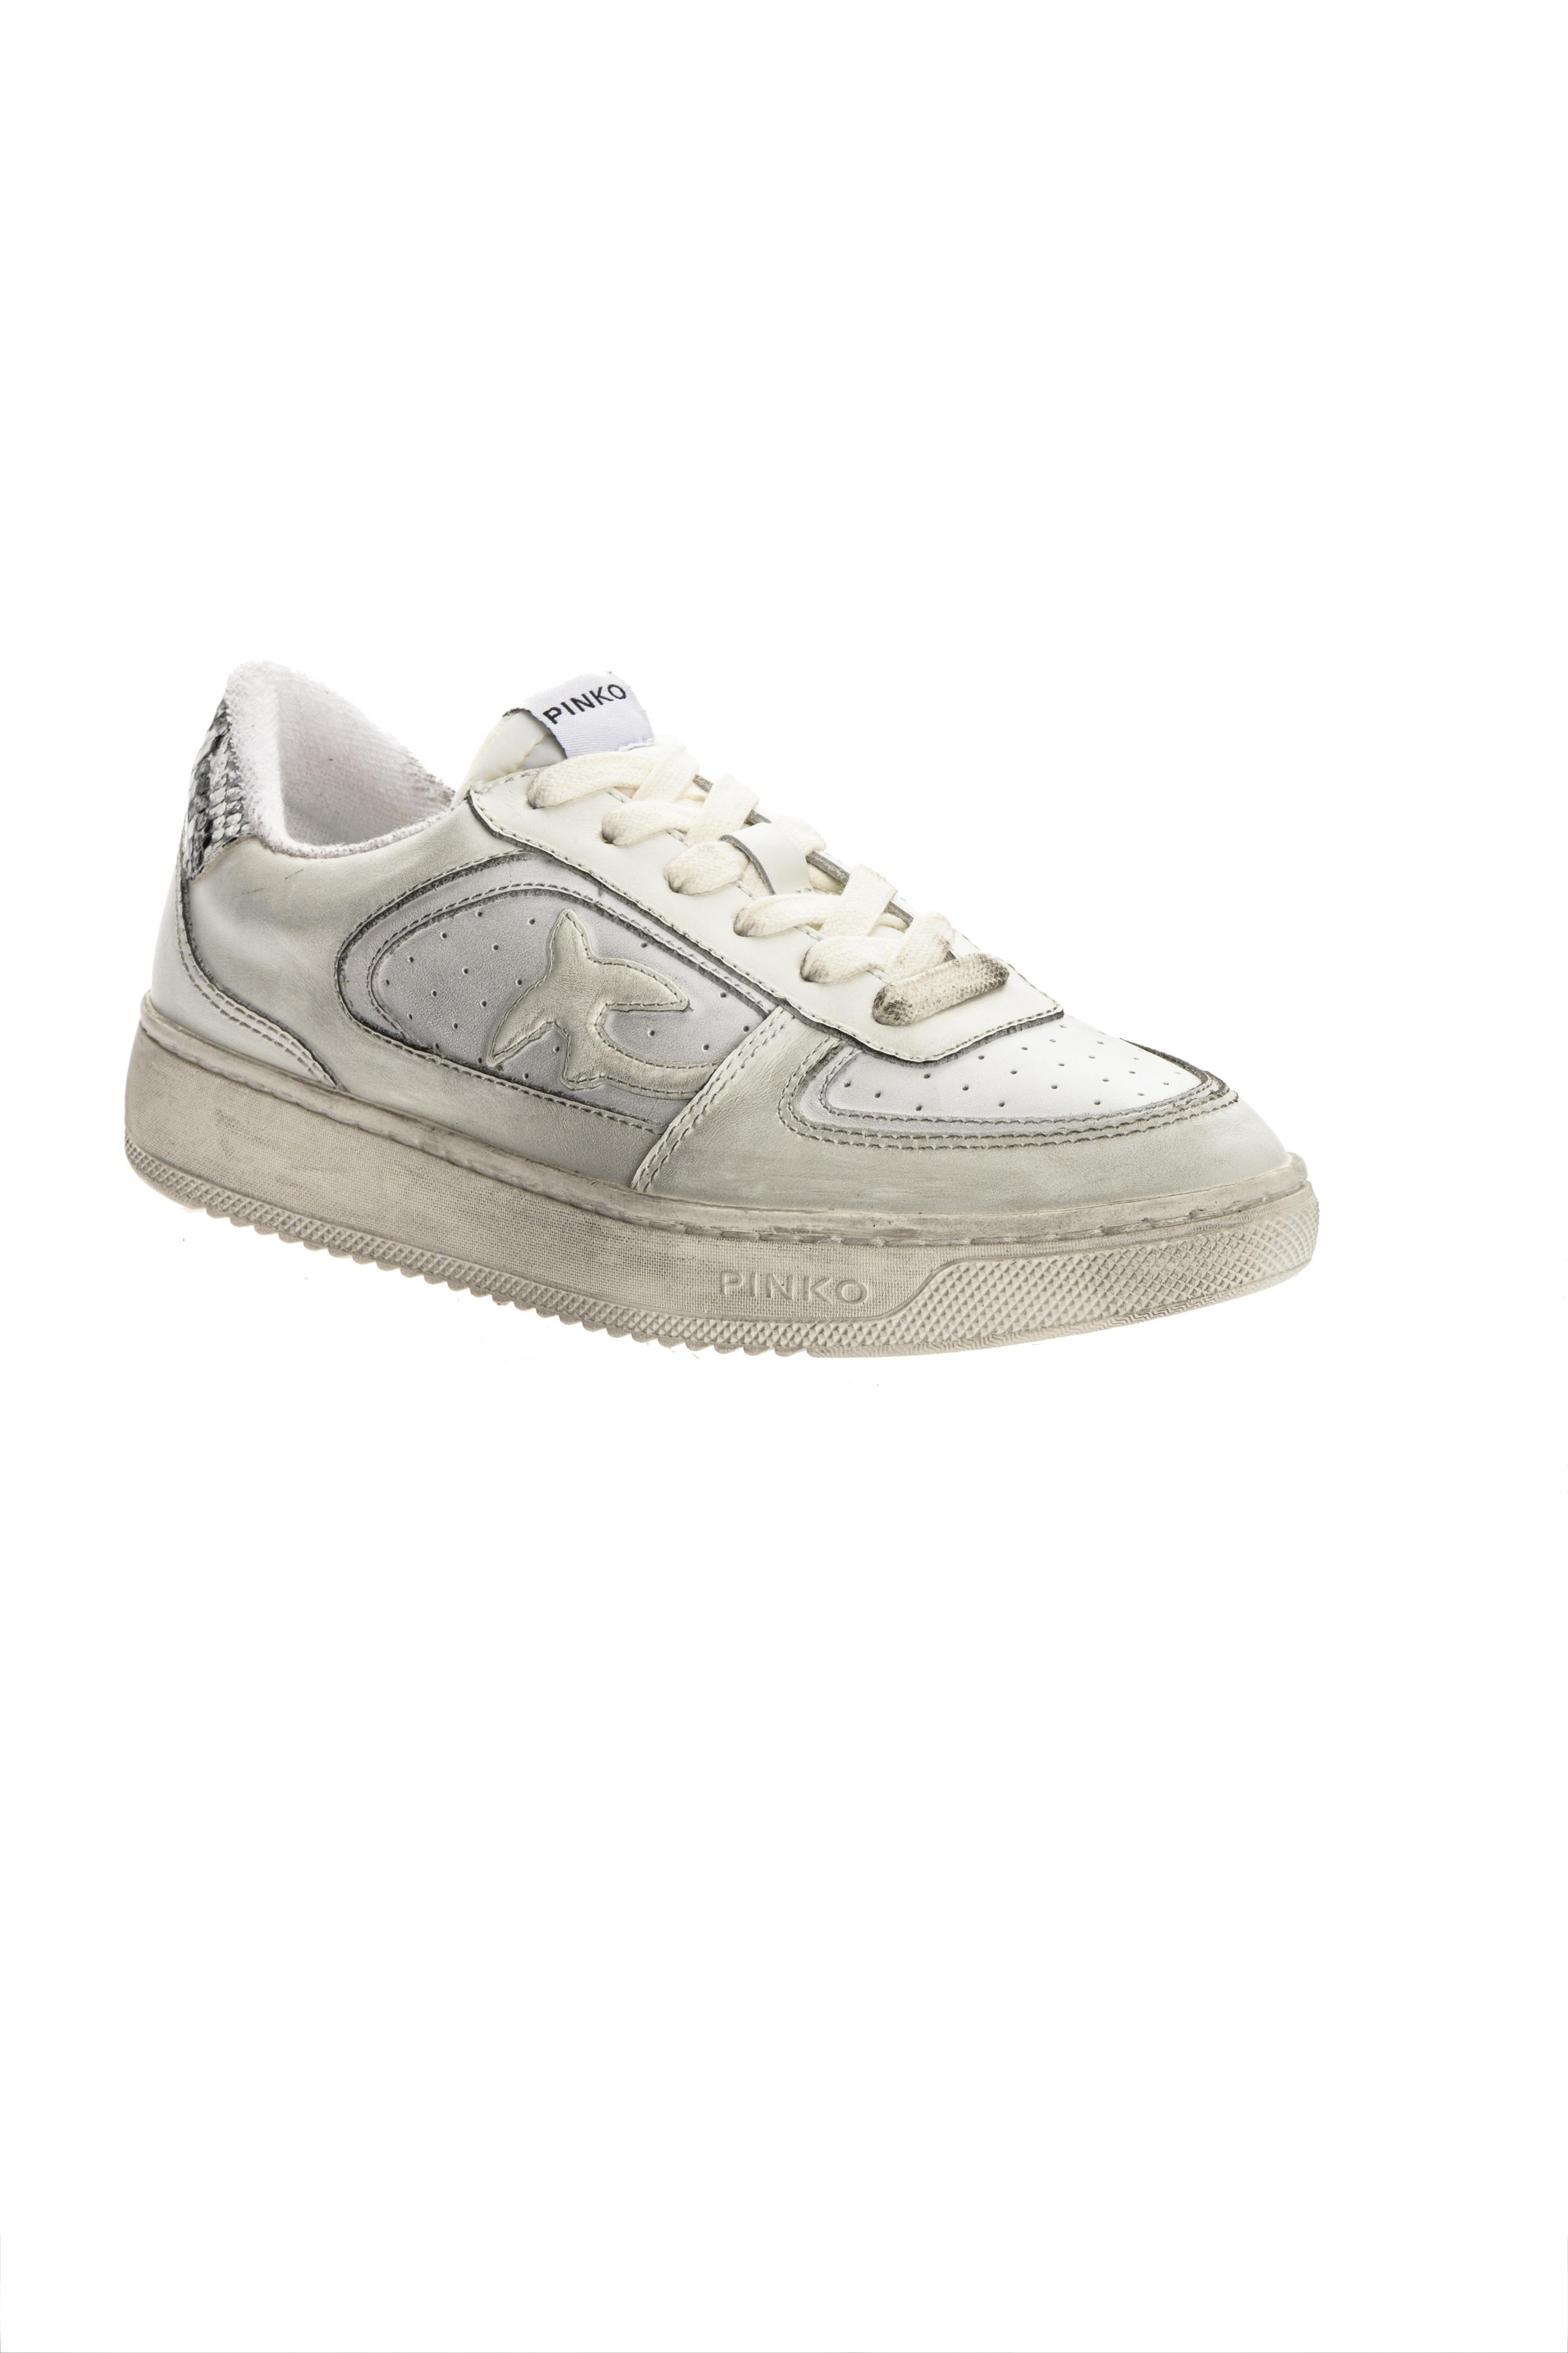 Sneaker Liquirizia low top in pelle Pinko